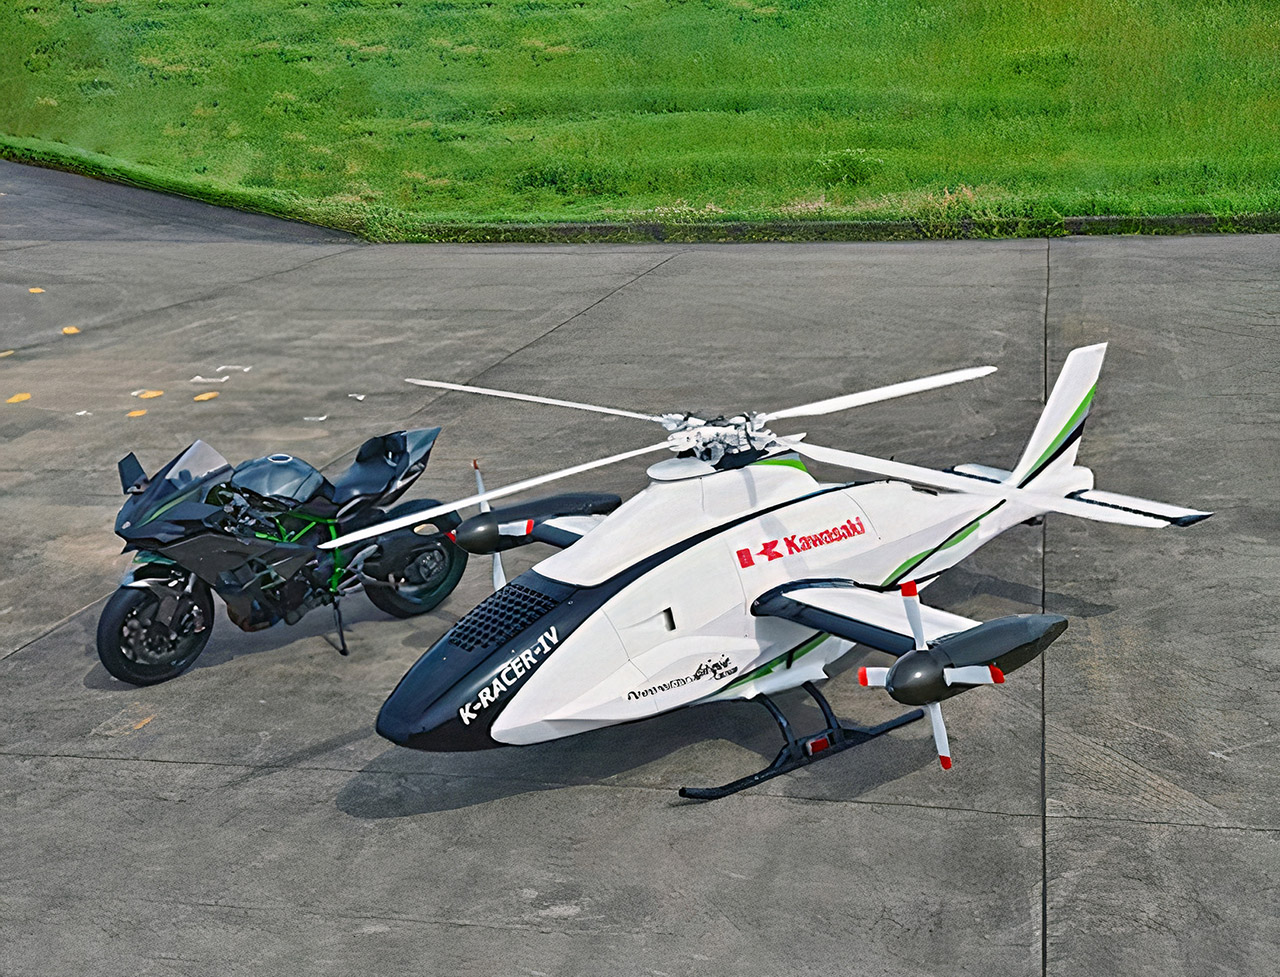 Kawasaki K-Racer Helicopter